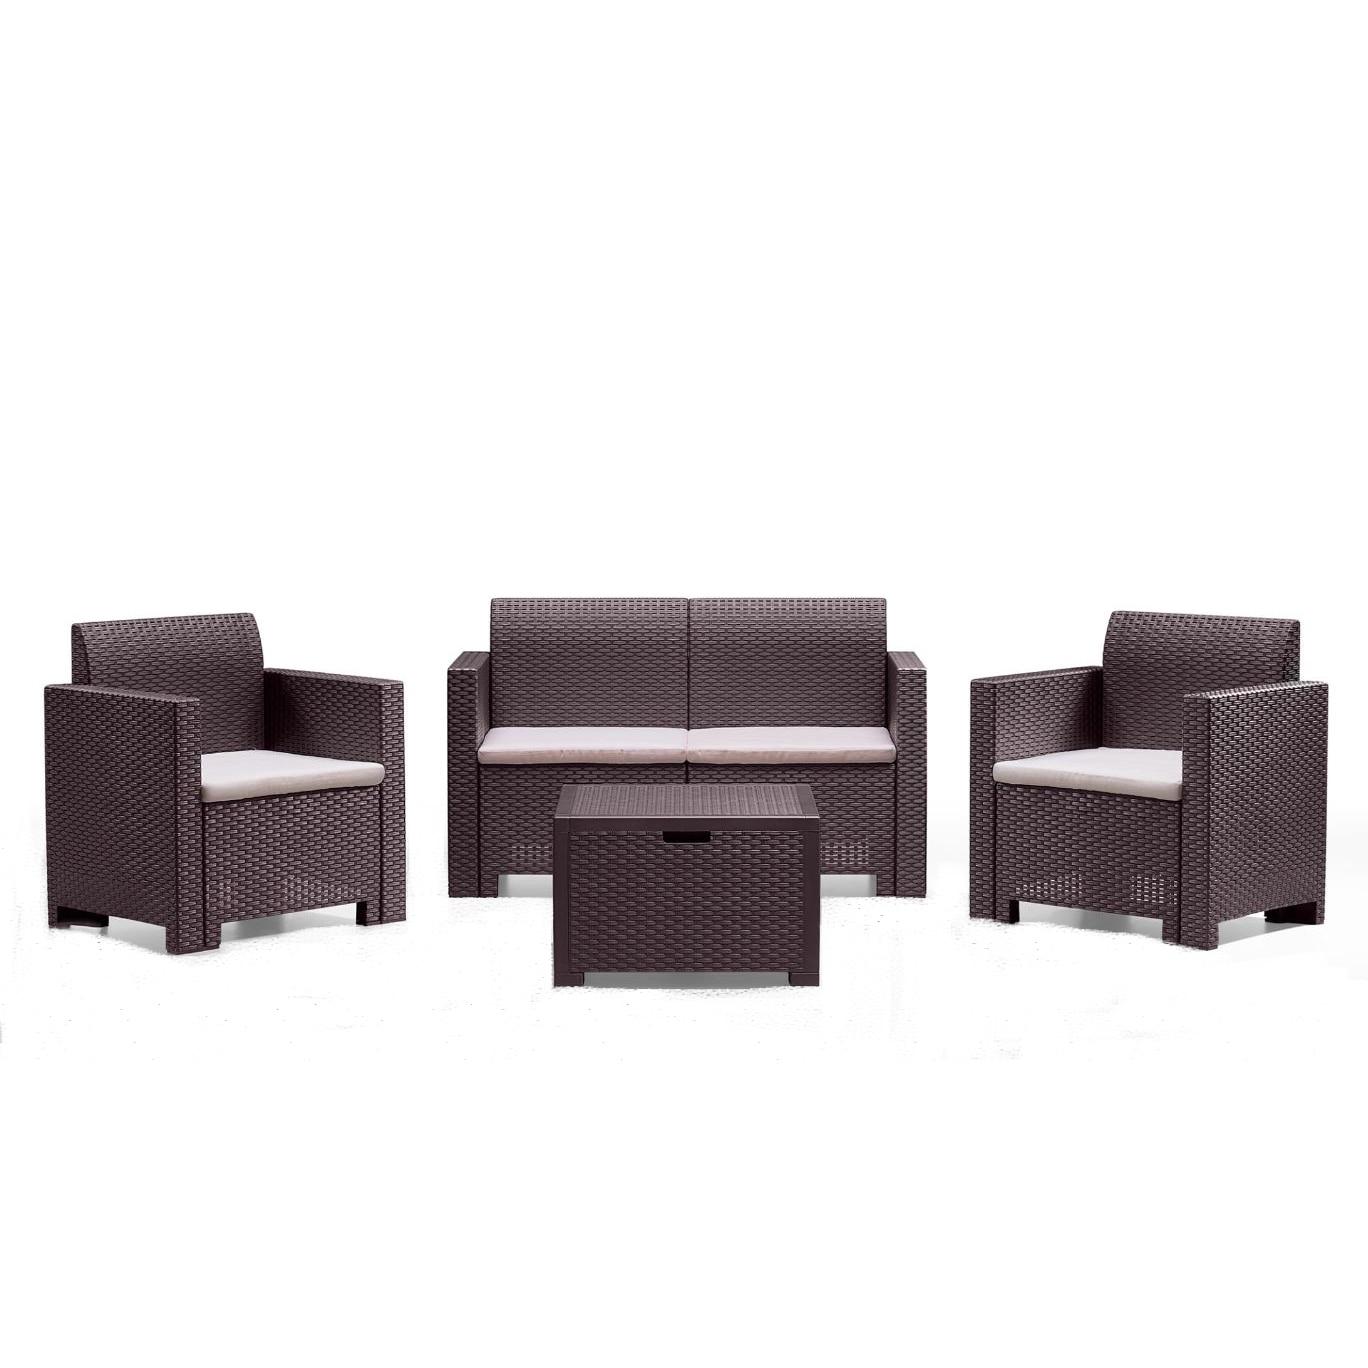 Fotografie Set mobilier gradina/terasa Nebraska, canapea 2 locuri + 2 fotolii + masuta depozitare, perne incluse, maro